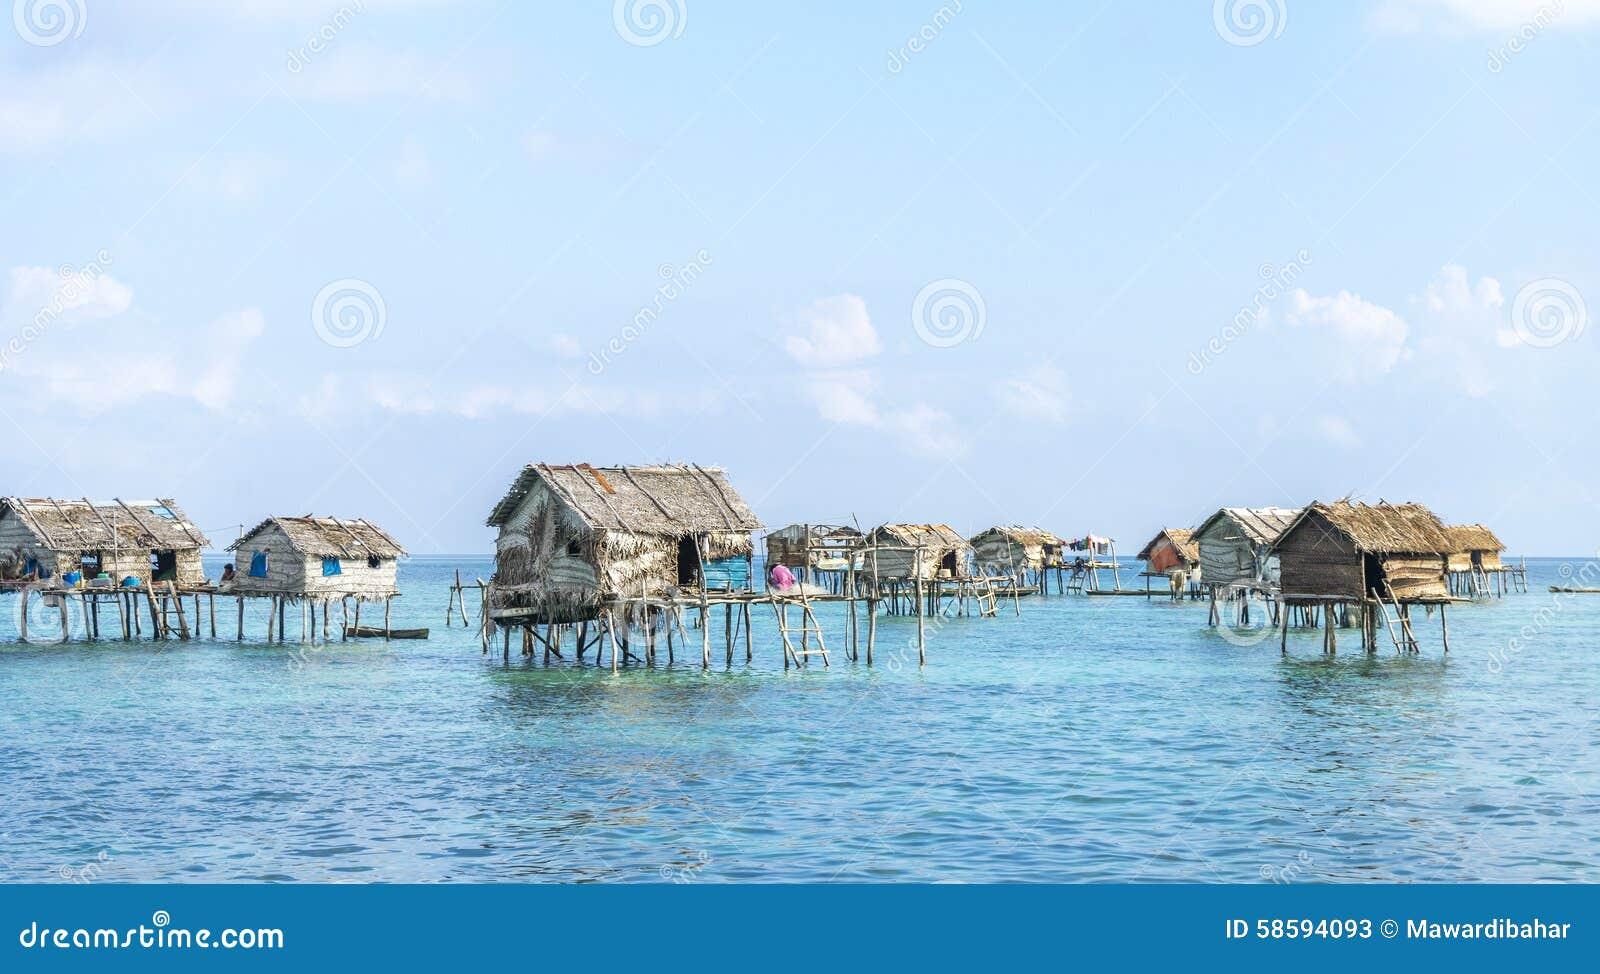 Bajau Laut House Stock Photo Image 58594093